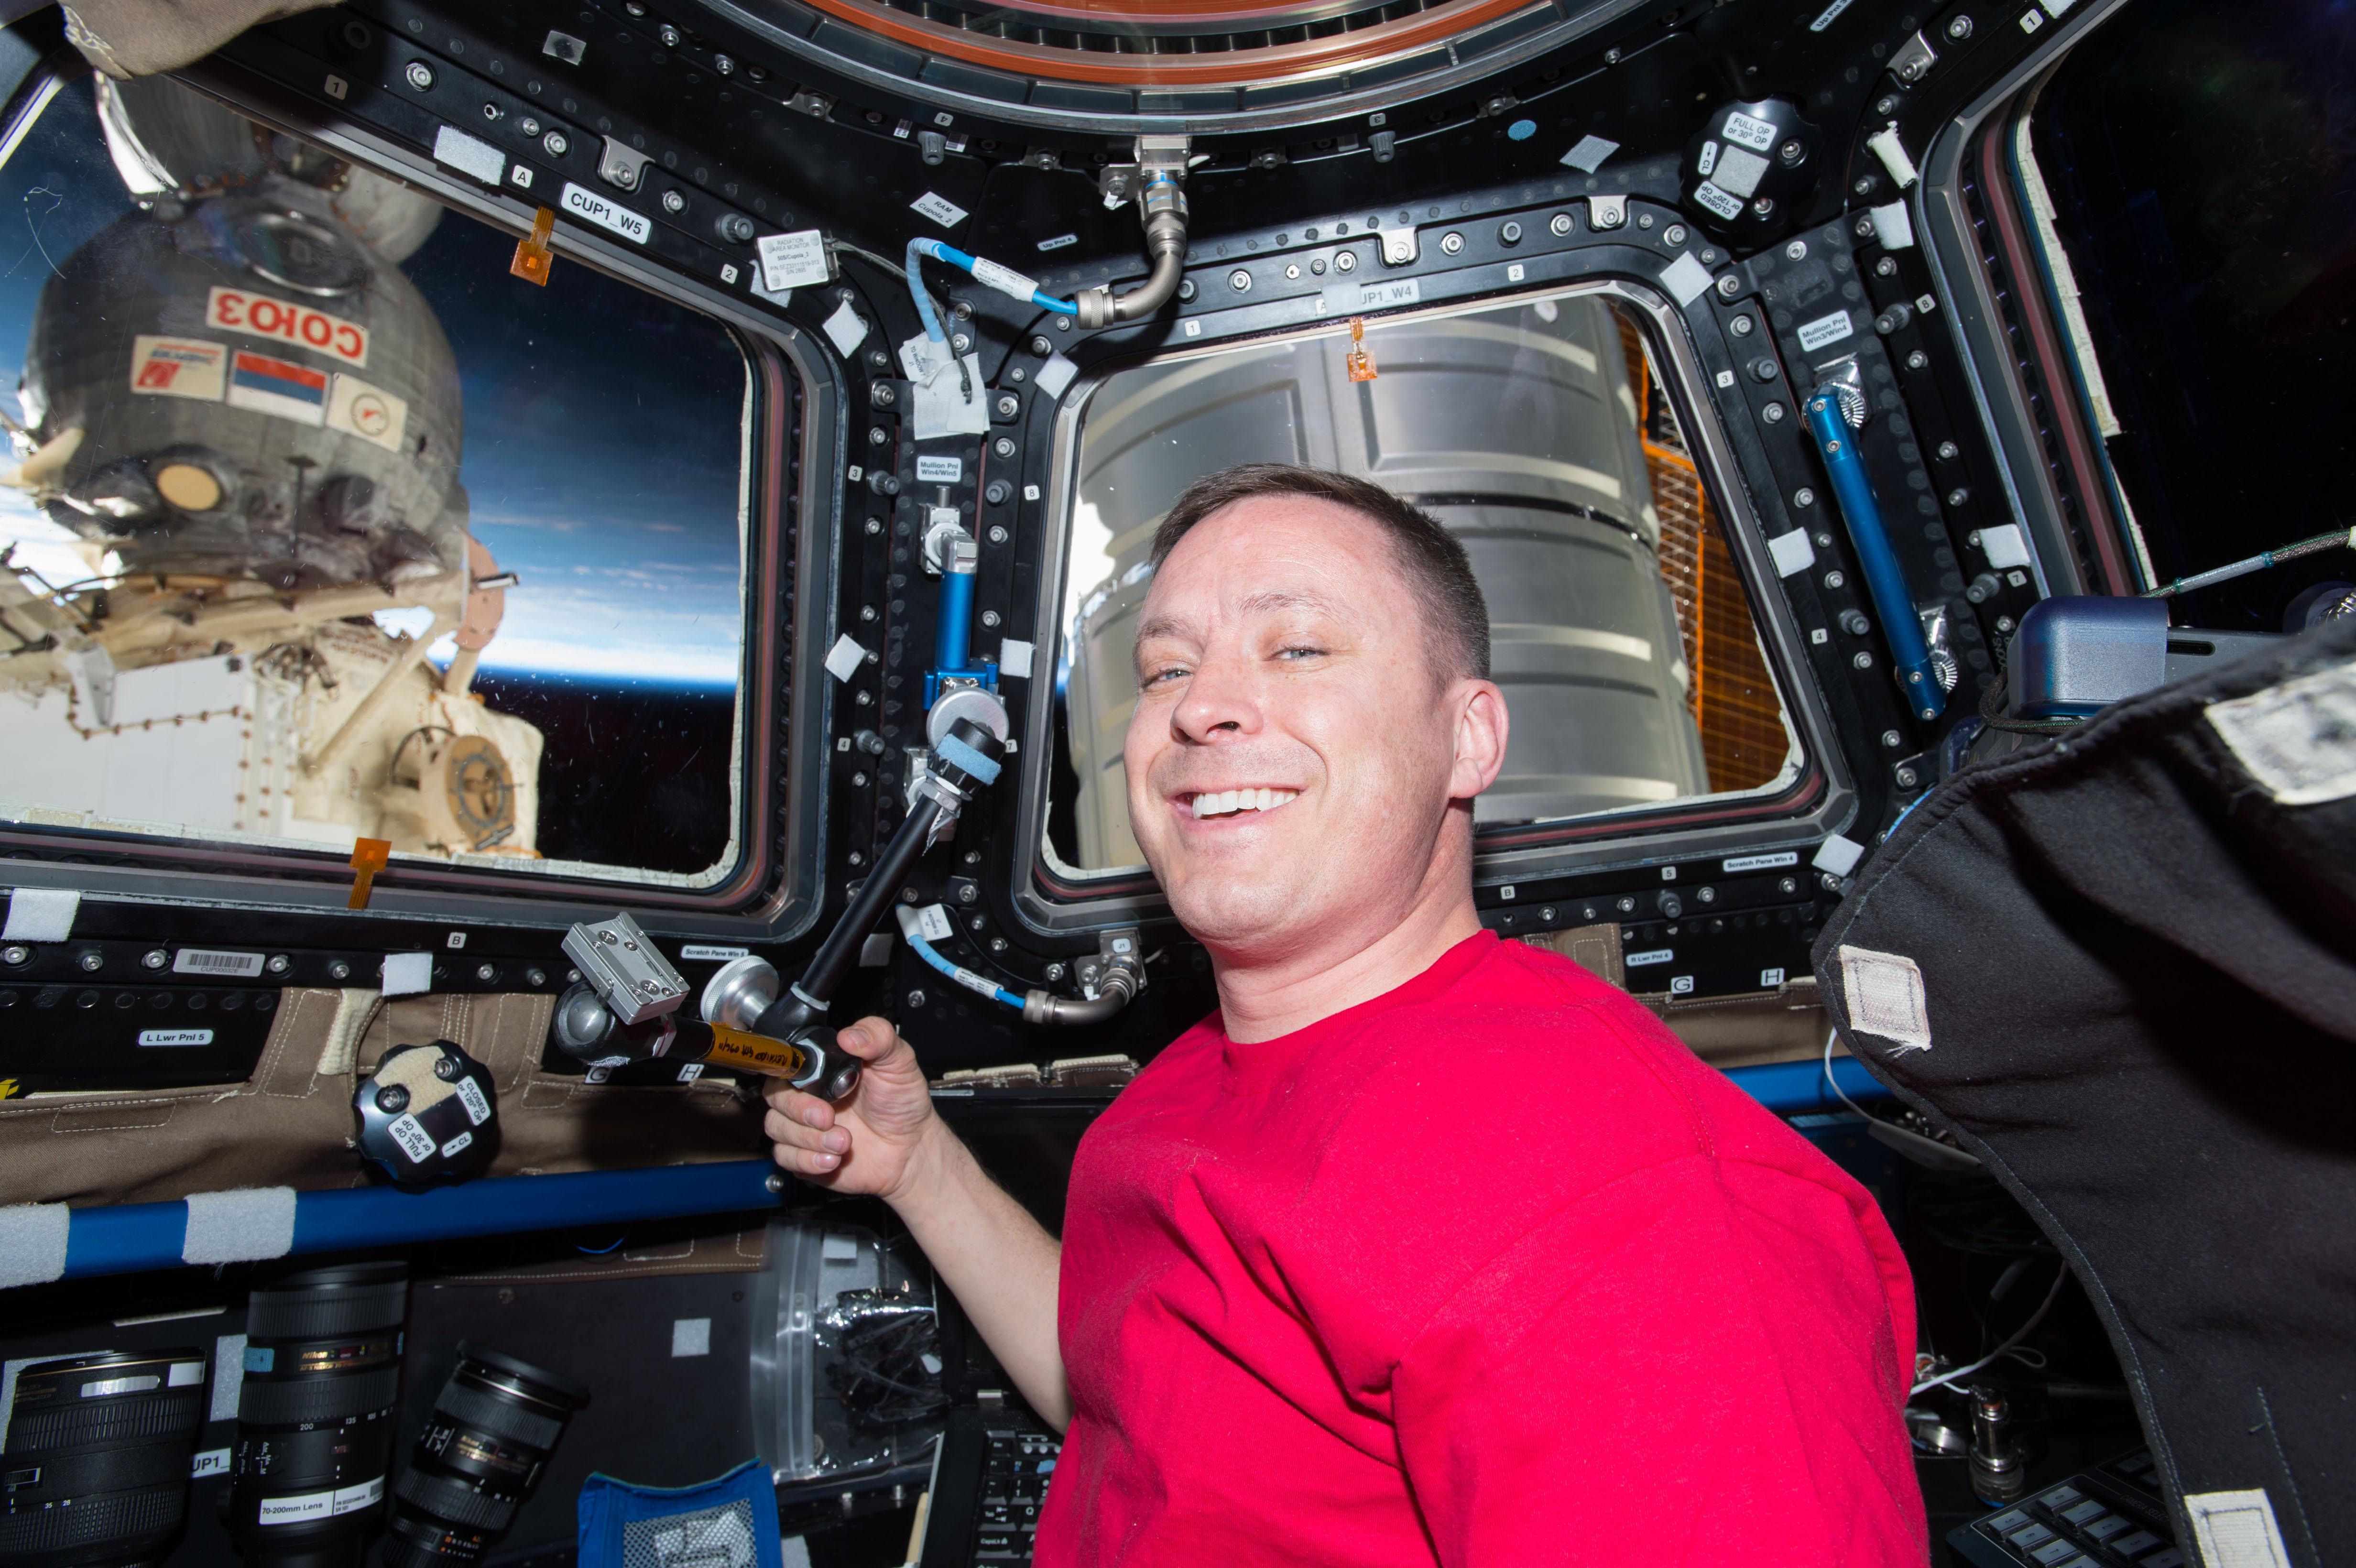 astronaut in maryland - photo #16